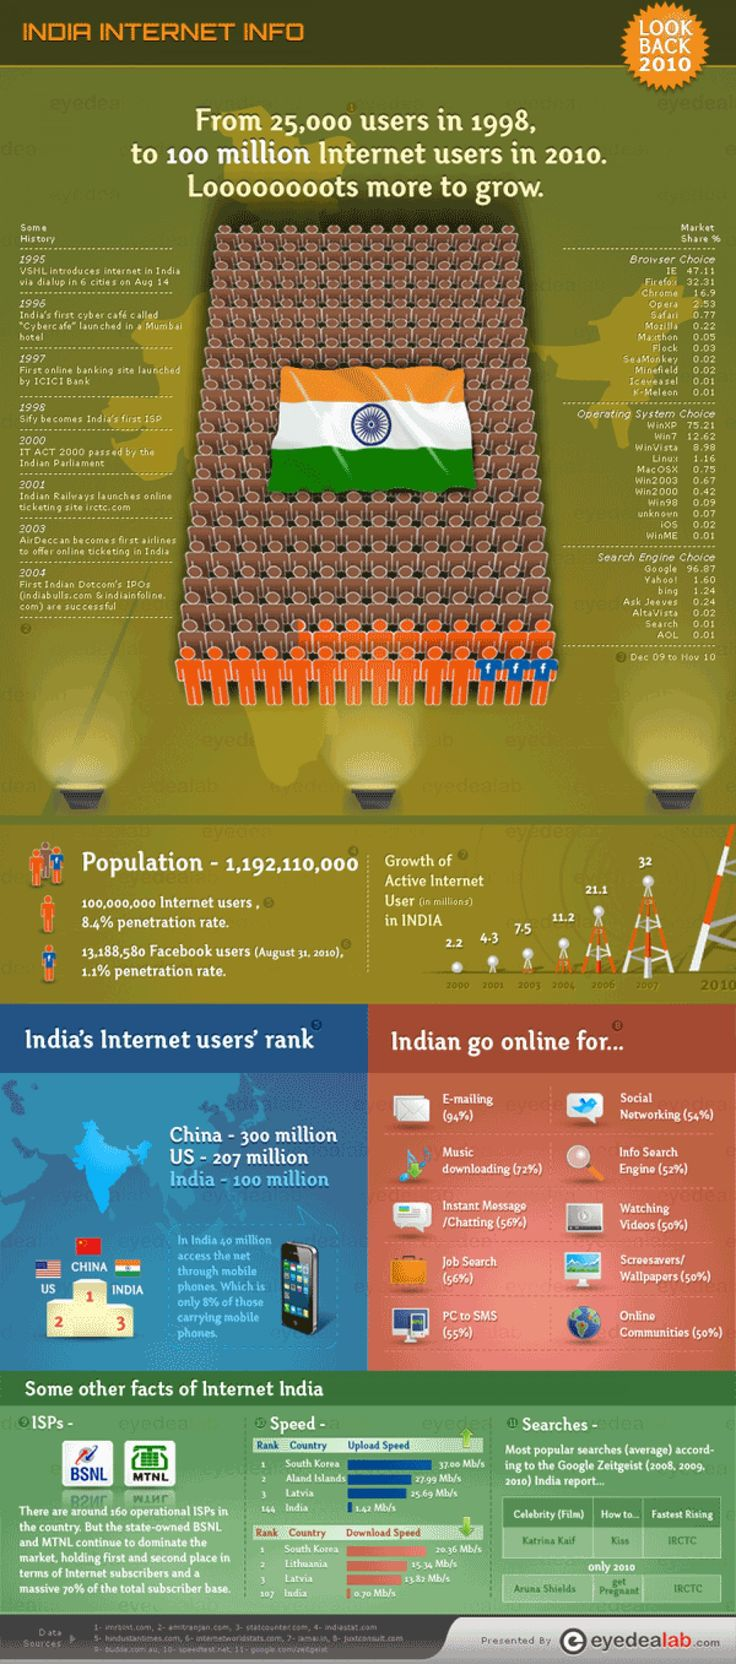 India Internet Info  Infographic